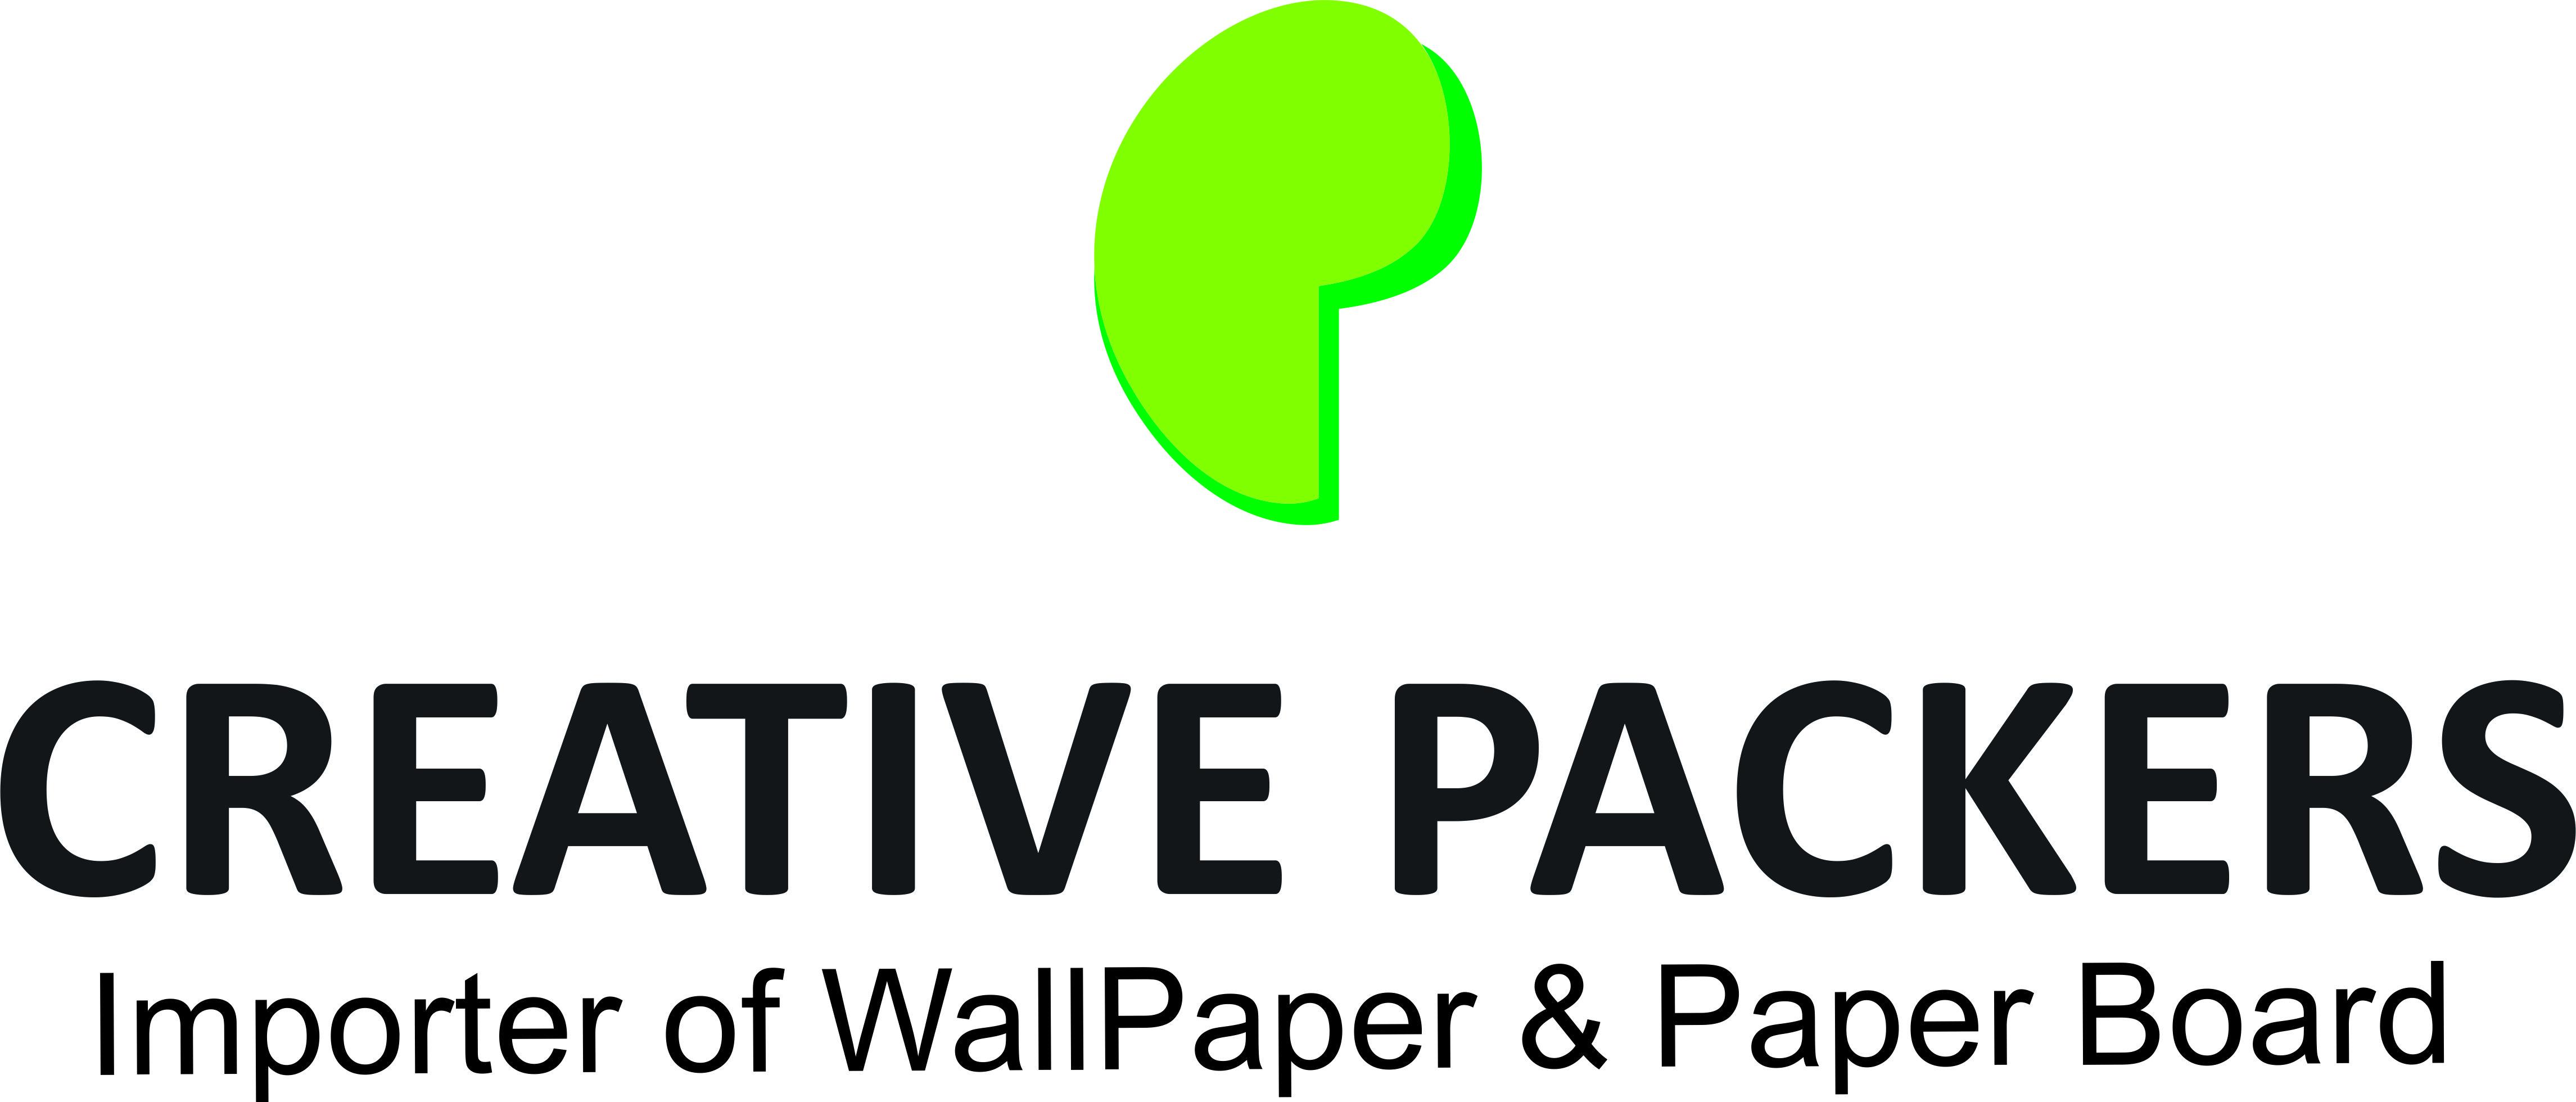 creative packers & logo 1